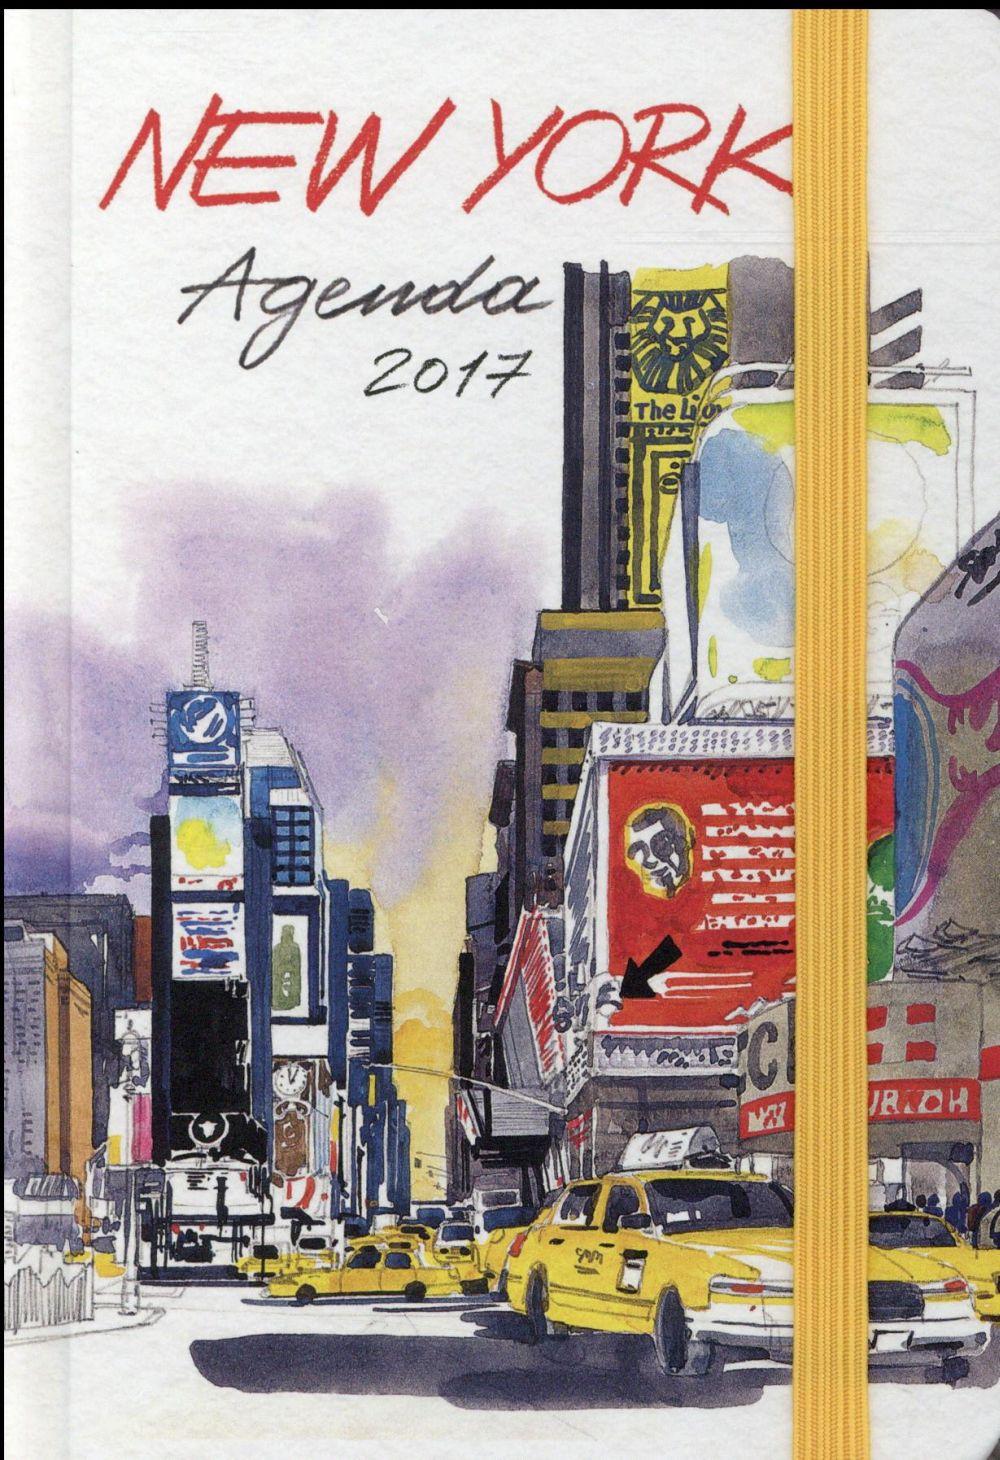 AGENDA NEW YORK 2017 (PETIT FORMAT)